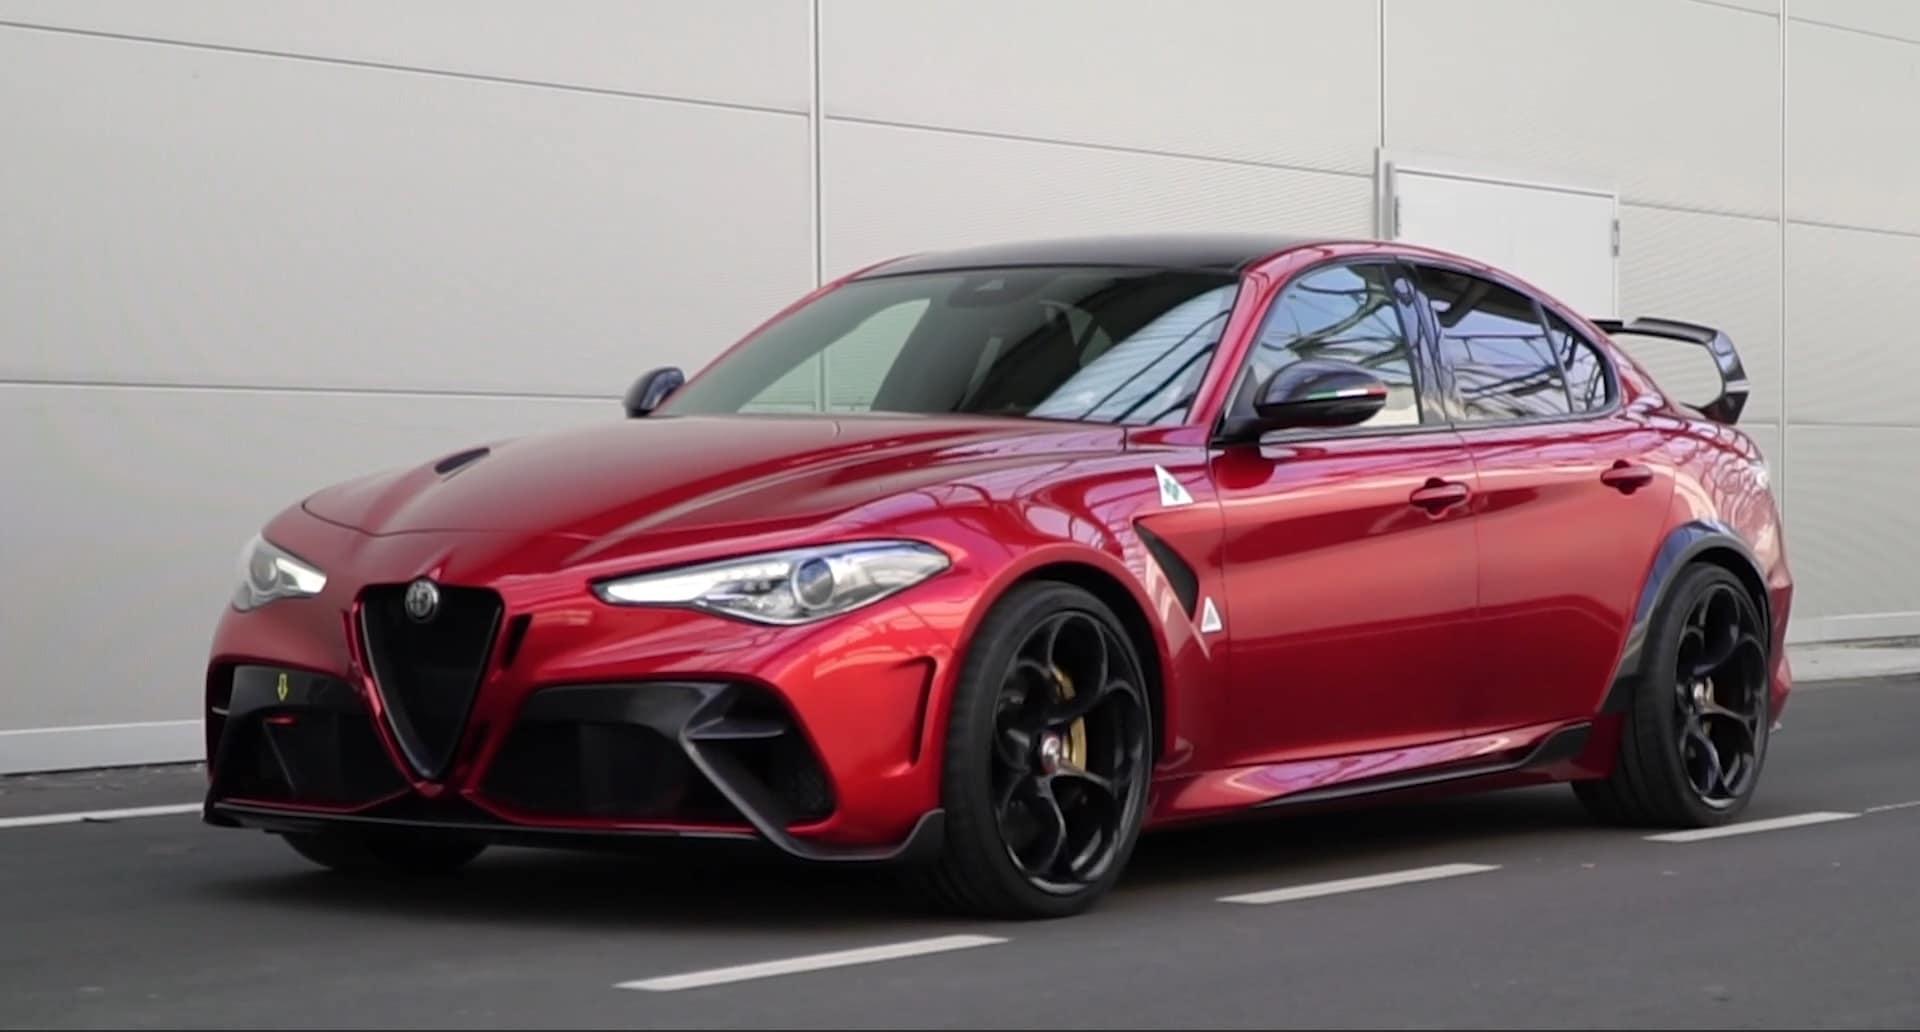 Alfa Romeo Giulia GTAm, Fiat 500 elettrica, Maserati MC20 ...